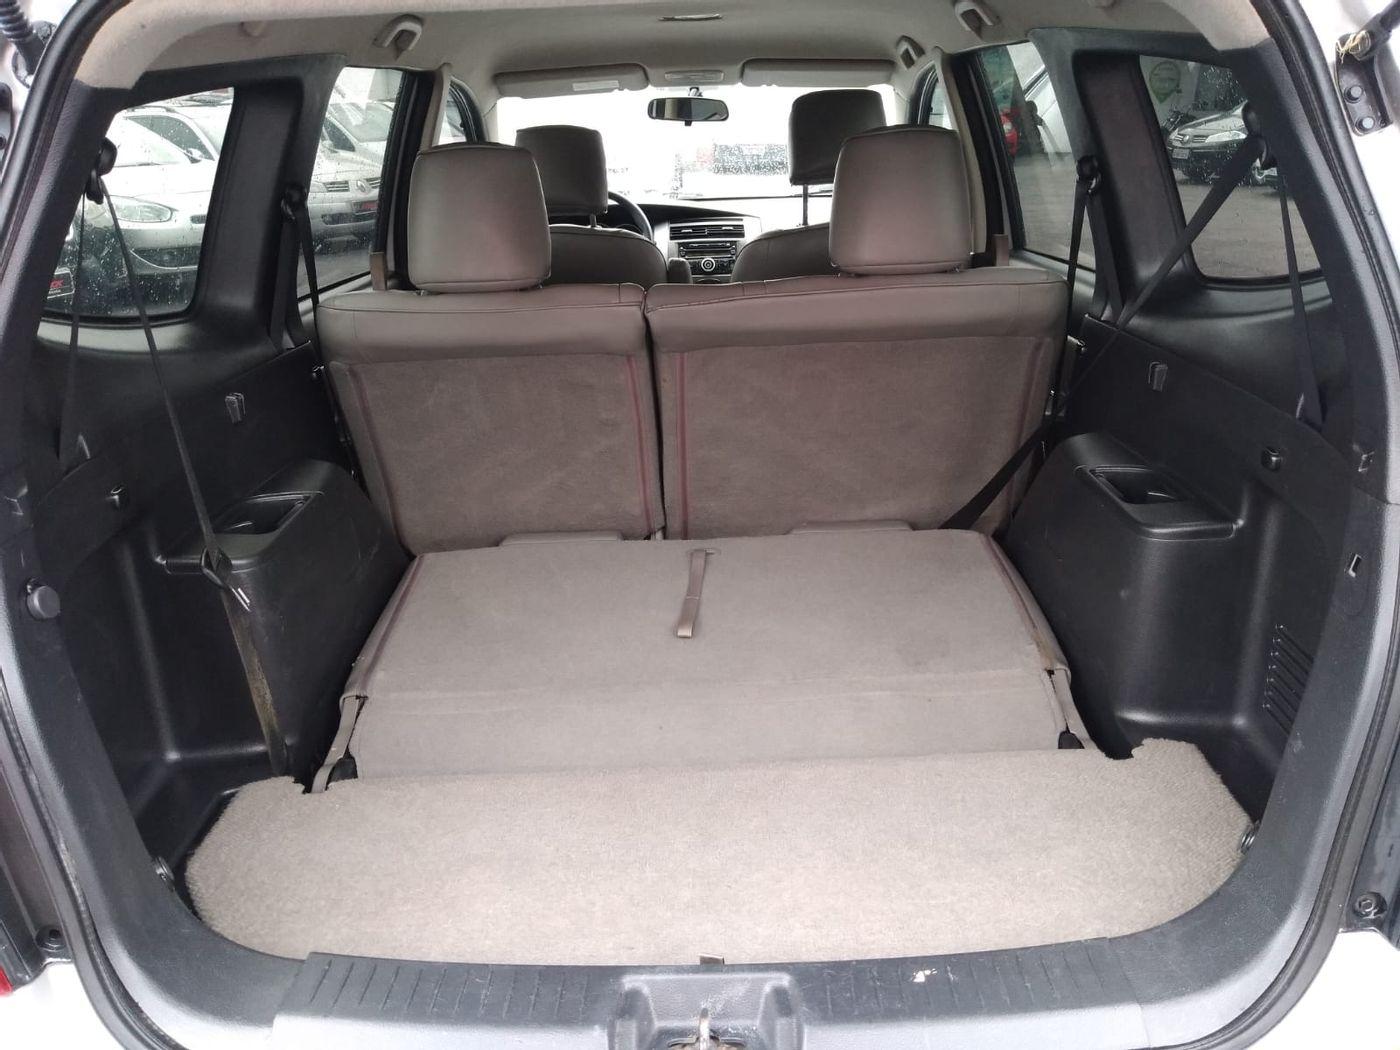 Nissan LIVINA GRAND SL 1.8 16V Flex Fuel Mec